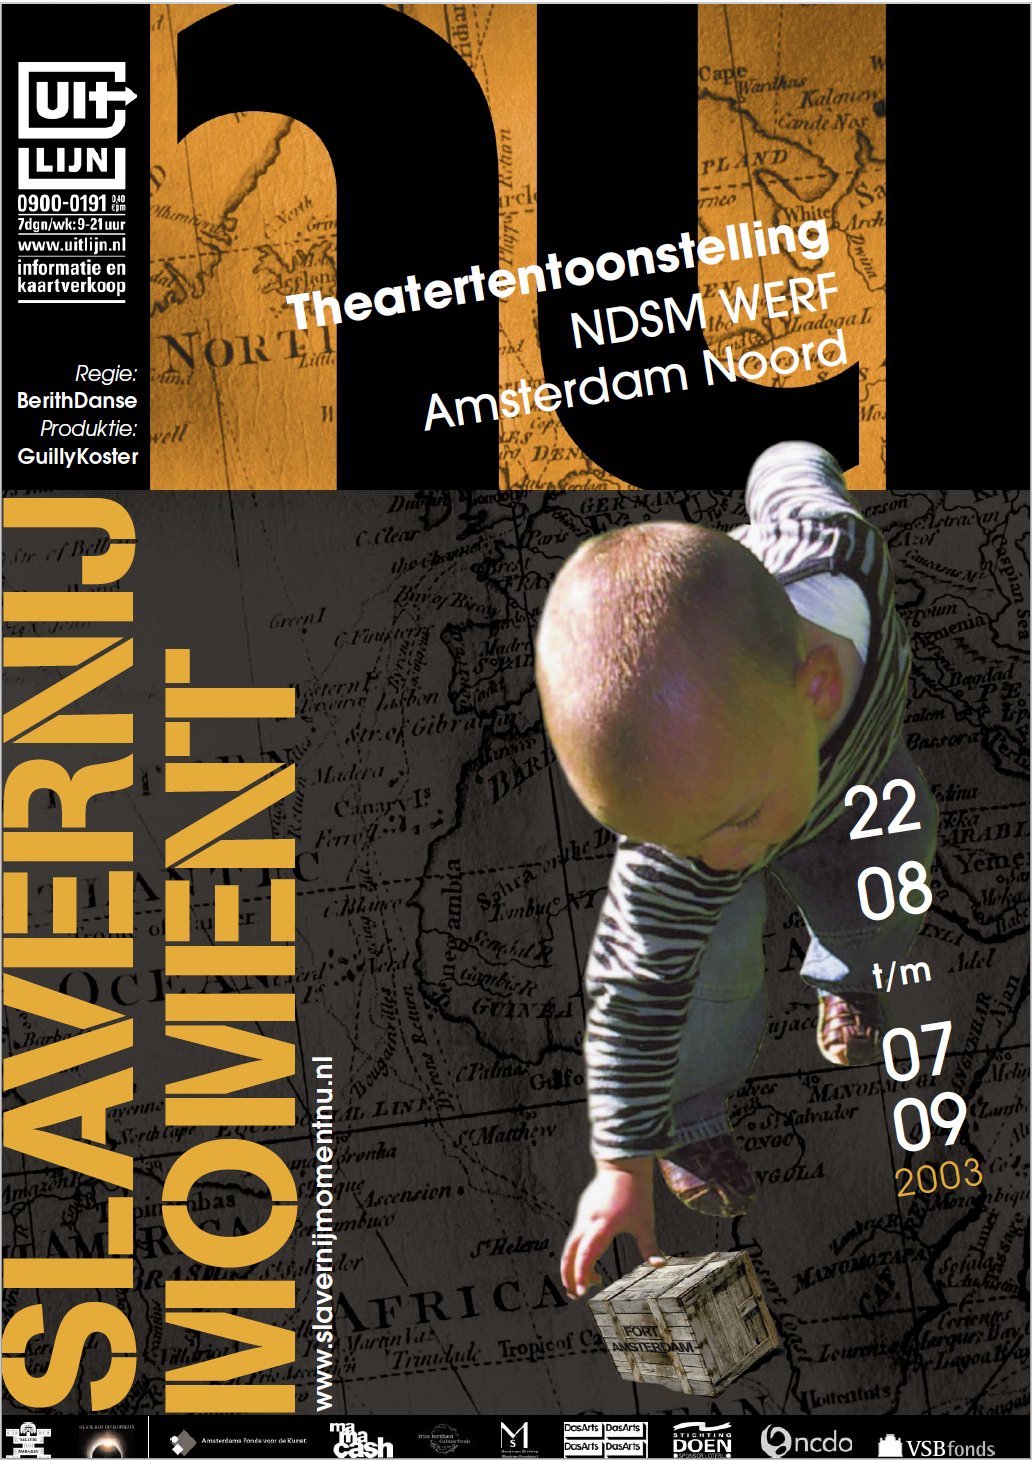 2003_netherlands_poster_slavernij_moment_nu